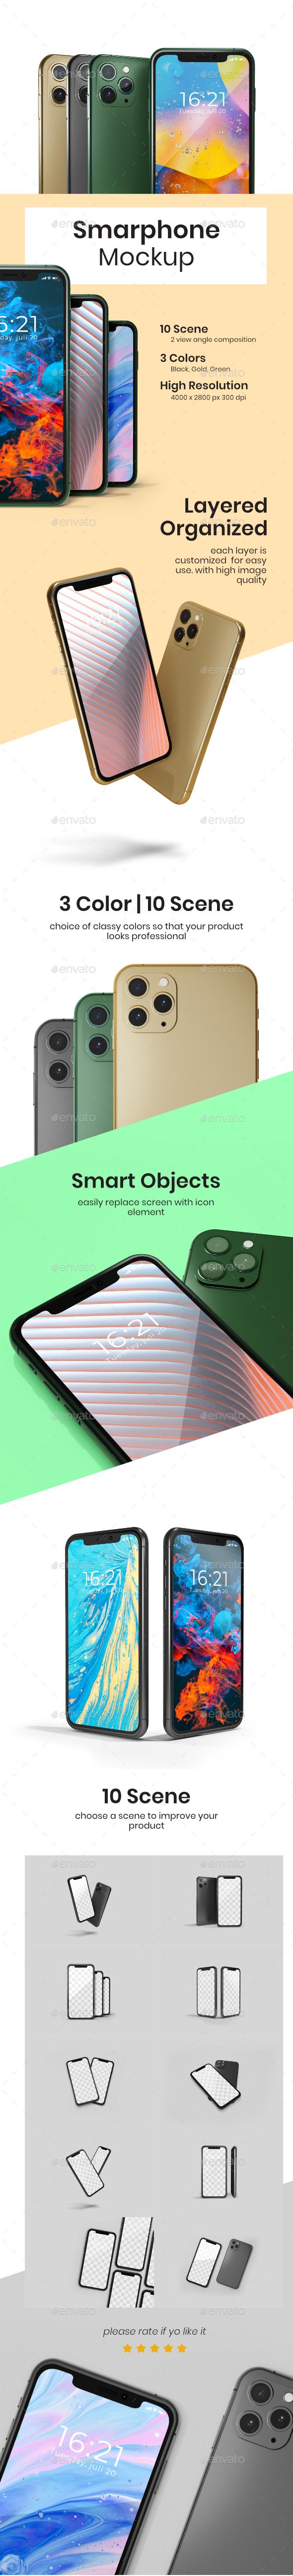 Smartphone Mock-ups PSD in 3 Colors